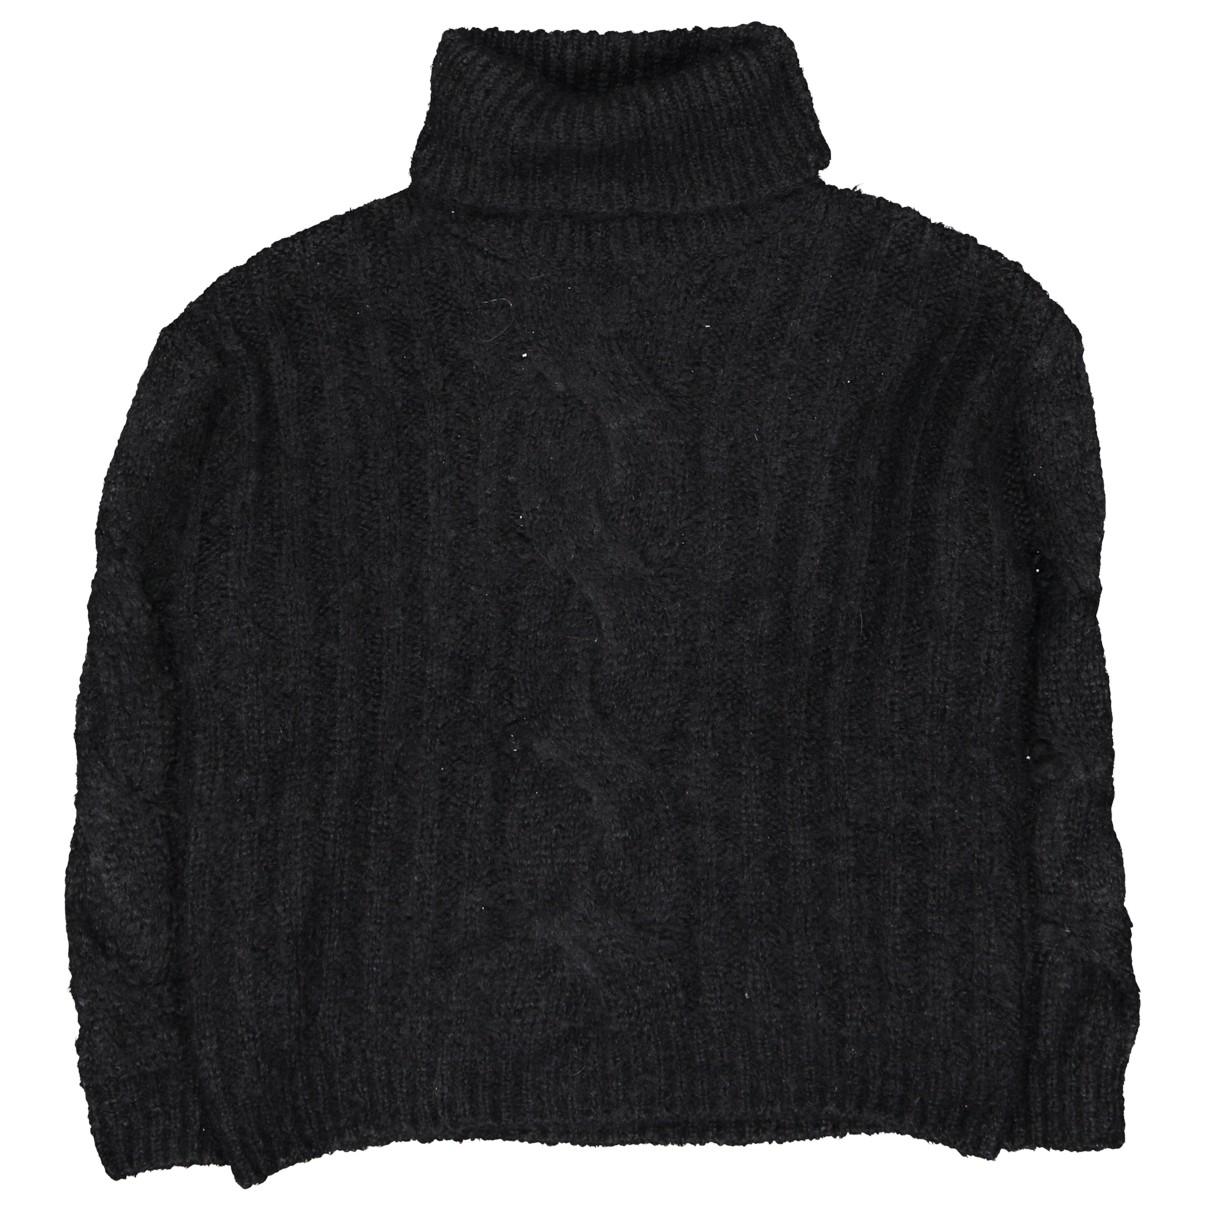 Max Mara \N Black Wool Knitwear for Women M International